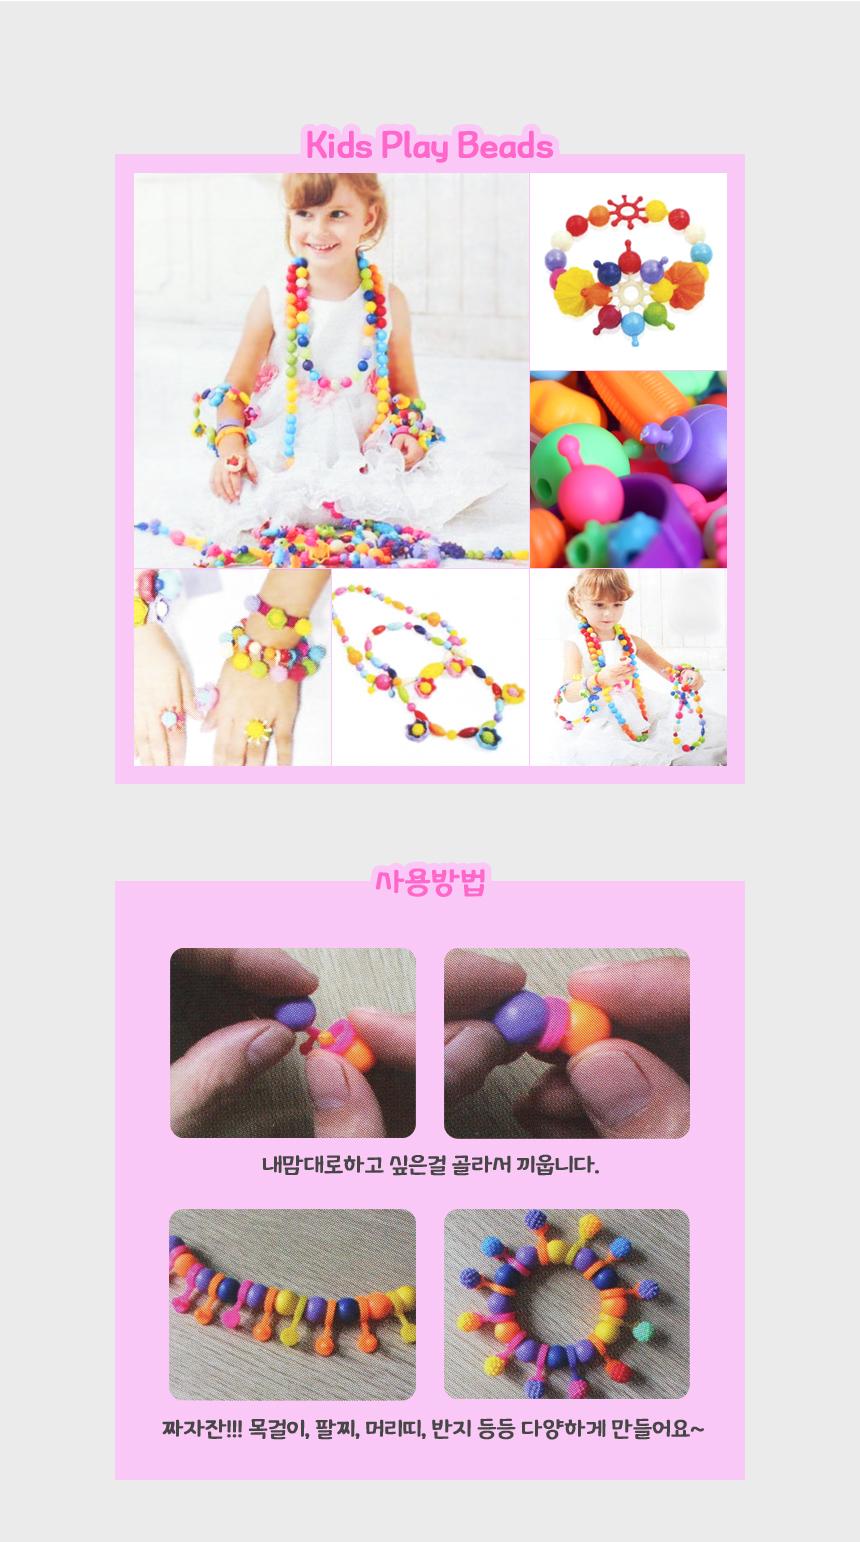 play_beads_03.jpg